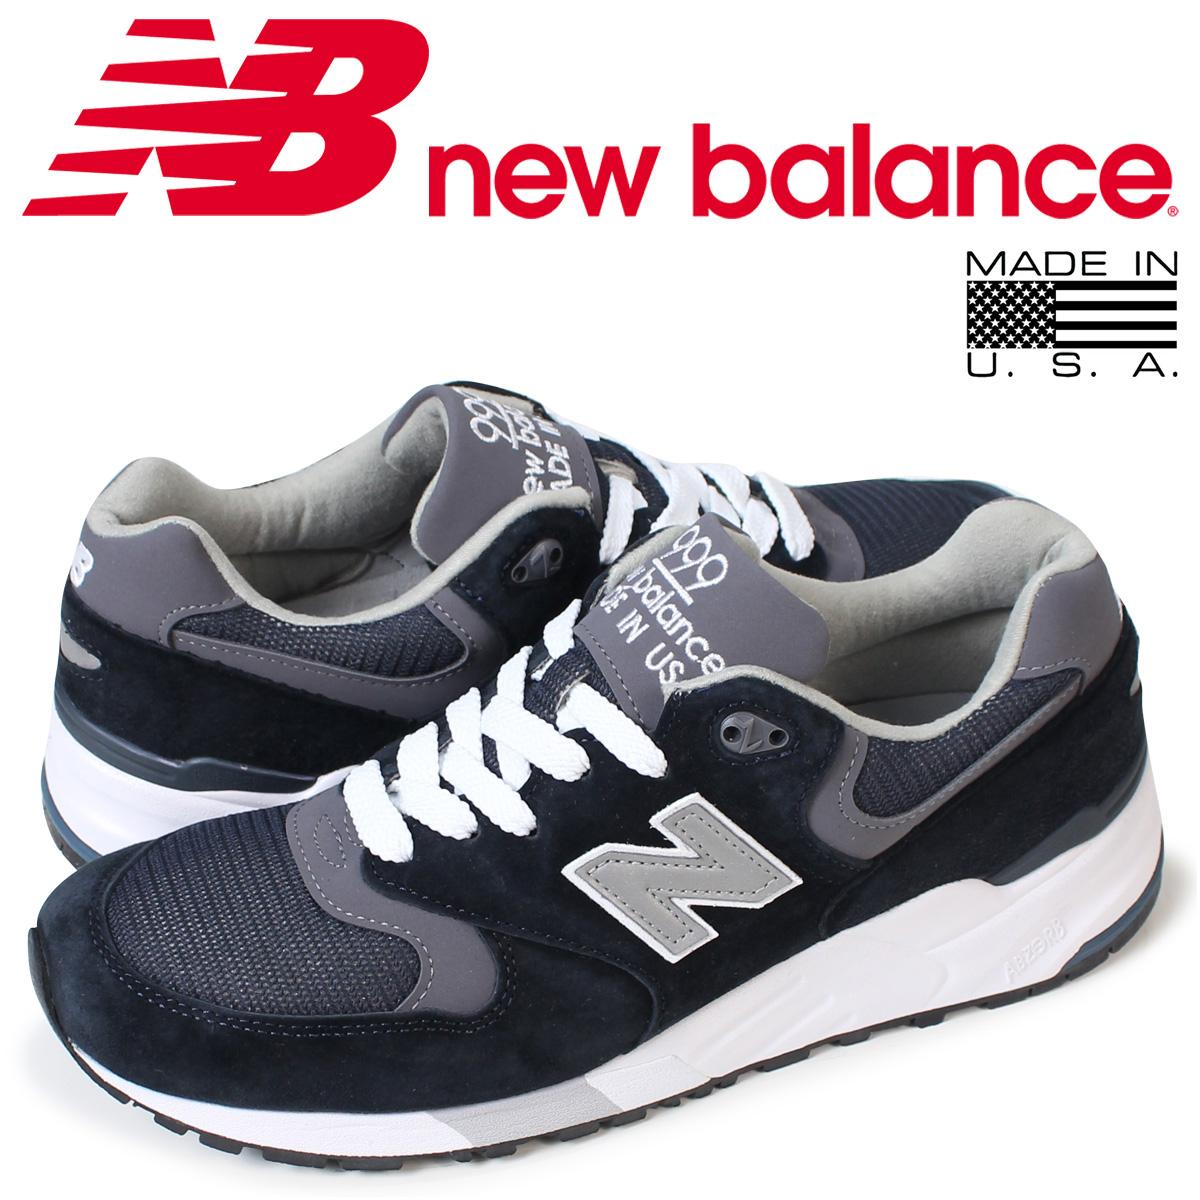 b07b9e596bde4 ニューバランス new balance M999CBL スニーカー あす楽 ニューバランス 999 メンズ new balance スニーカー  M999CBL Dワイズ